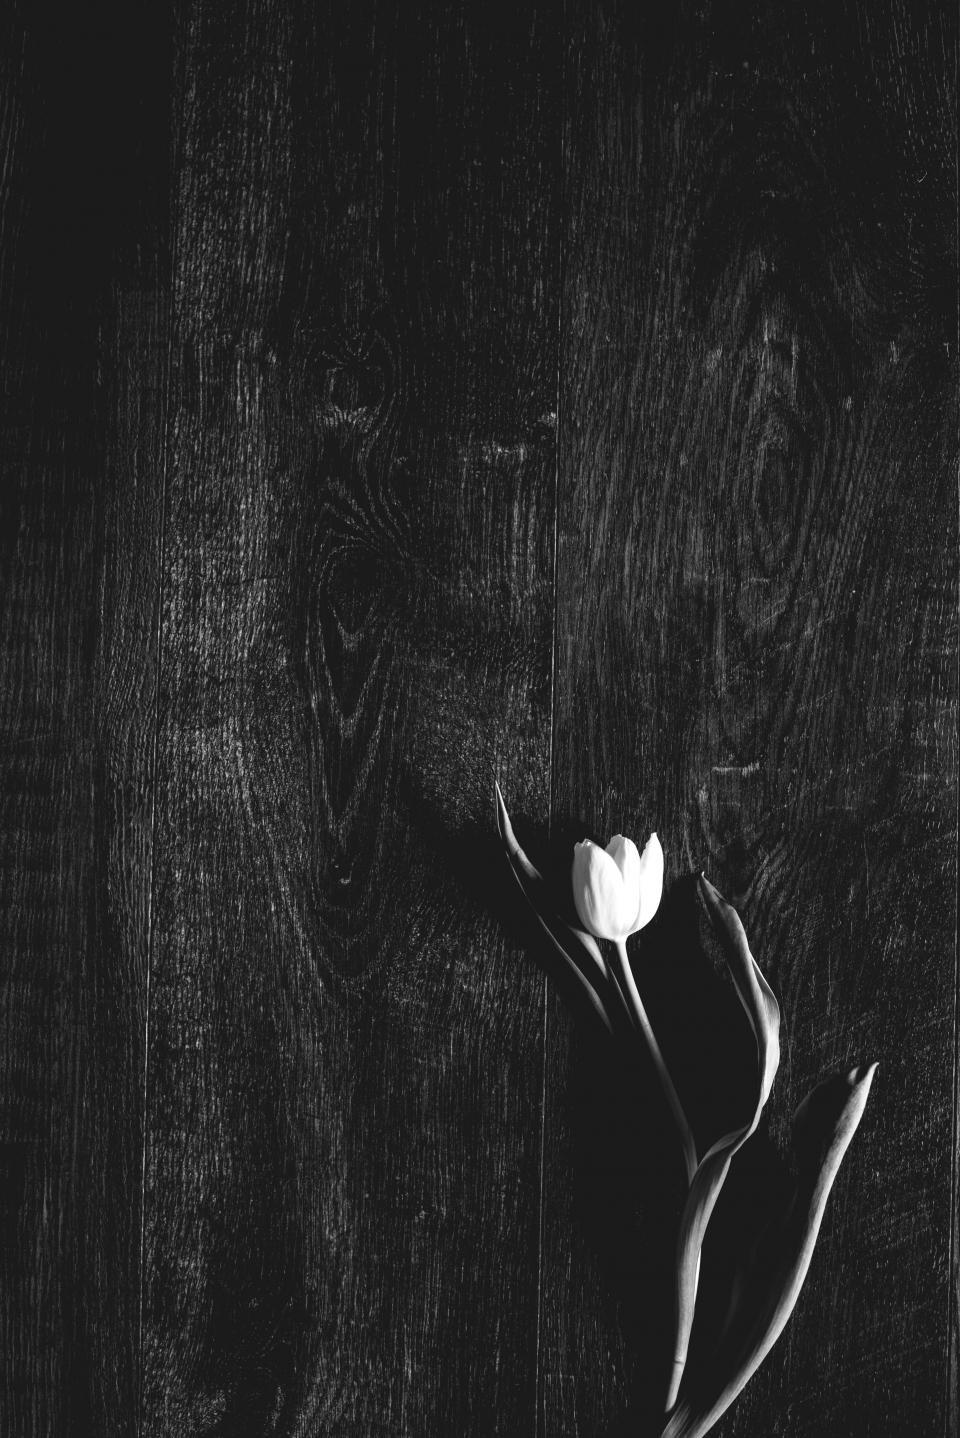 flower, white, petal, bloom, garden, plant, nature, autumn, fall, table, black and white, monochrome